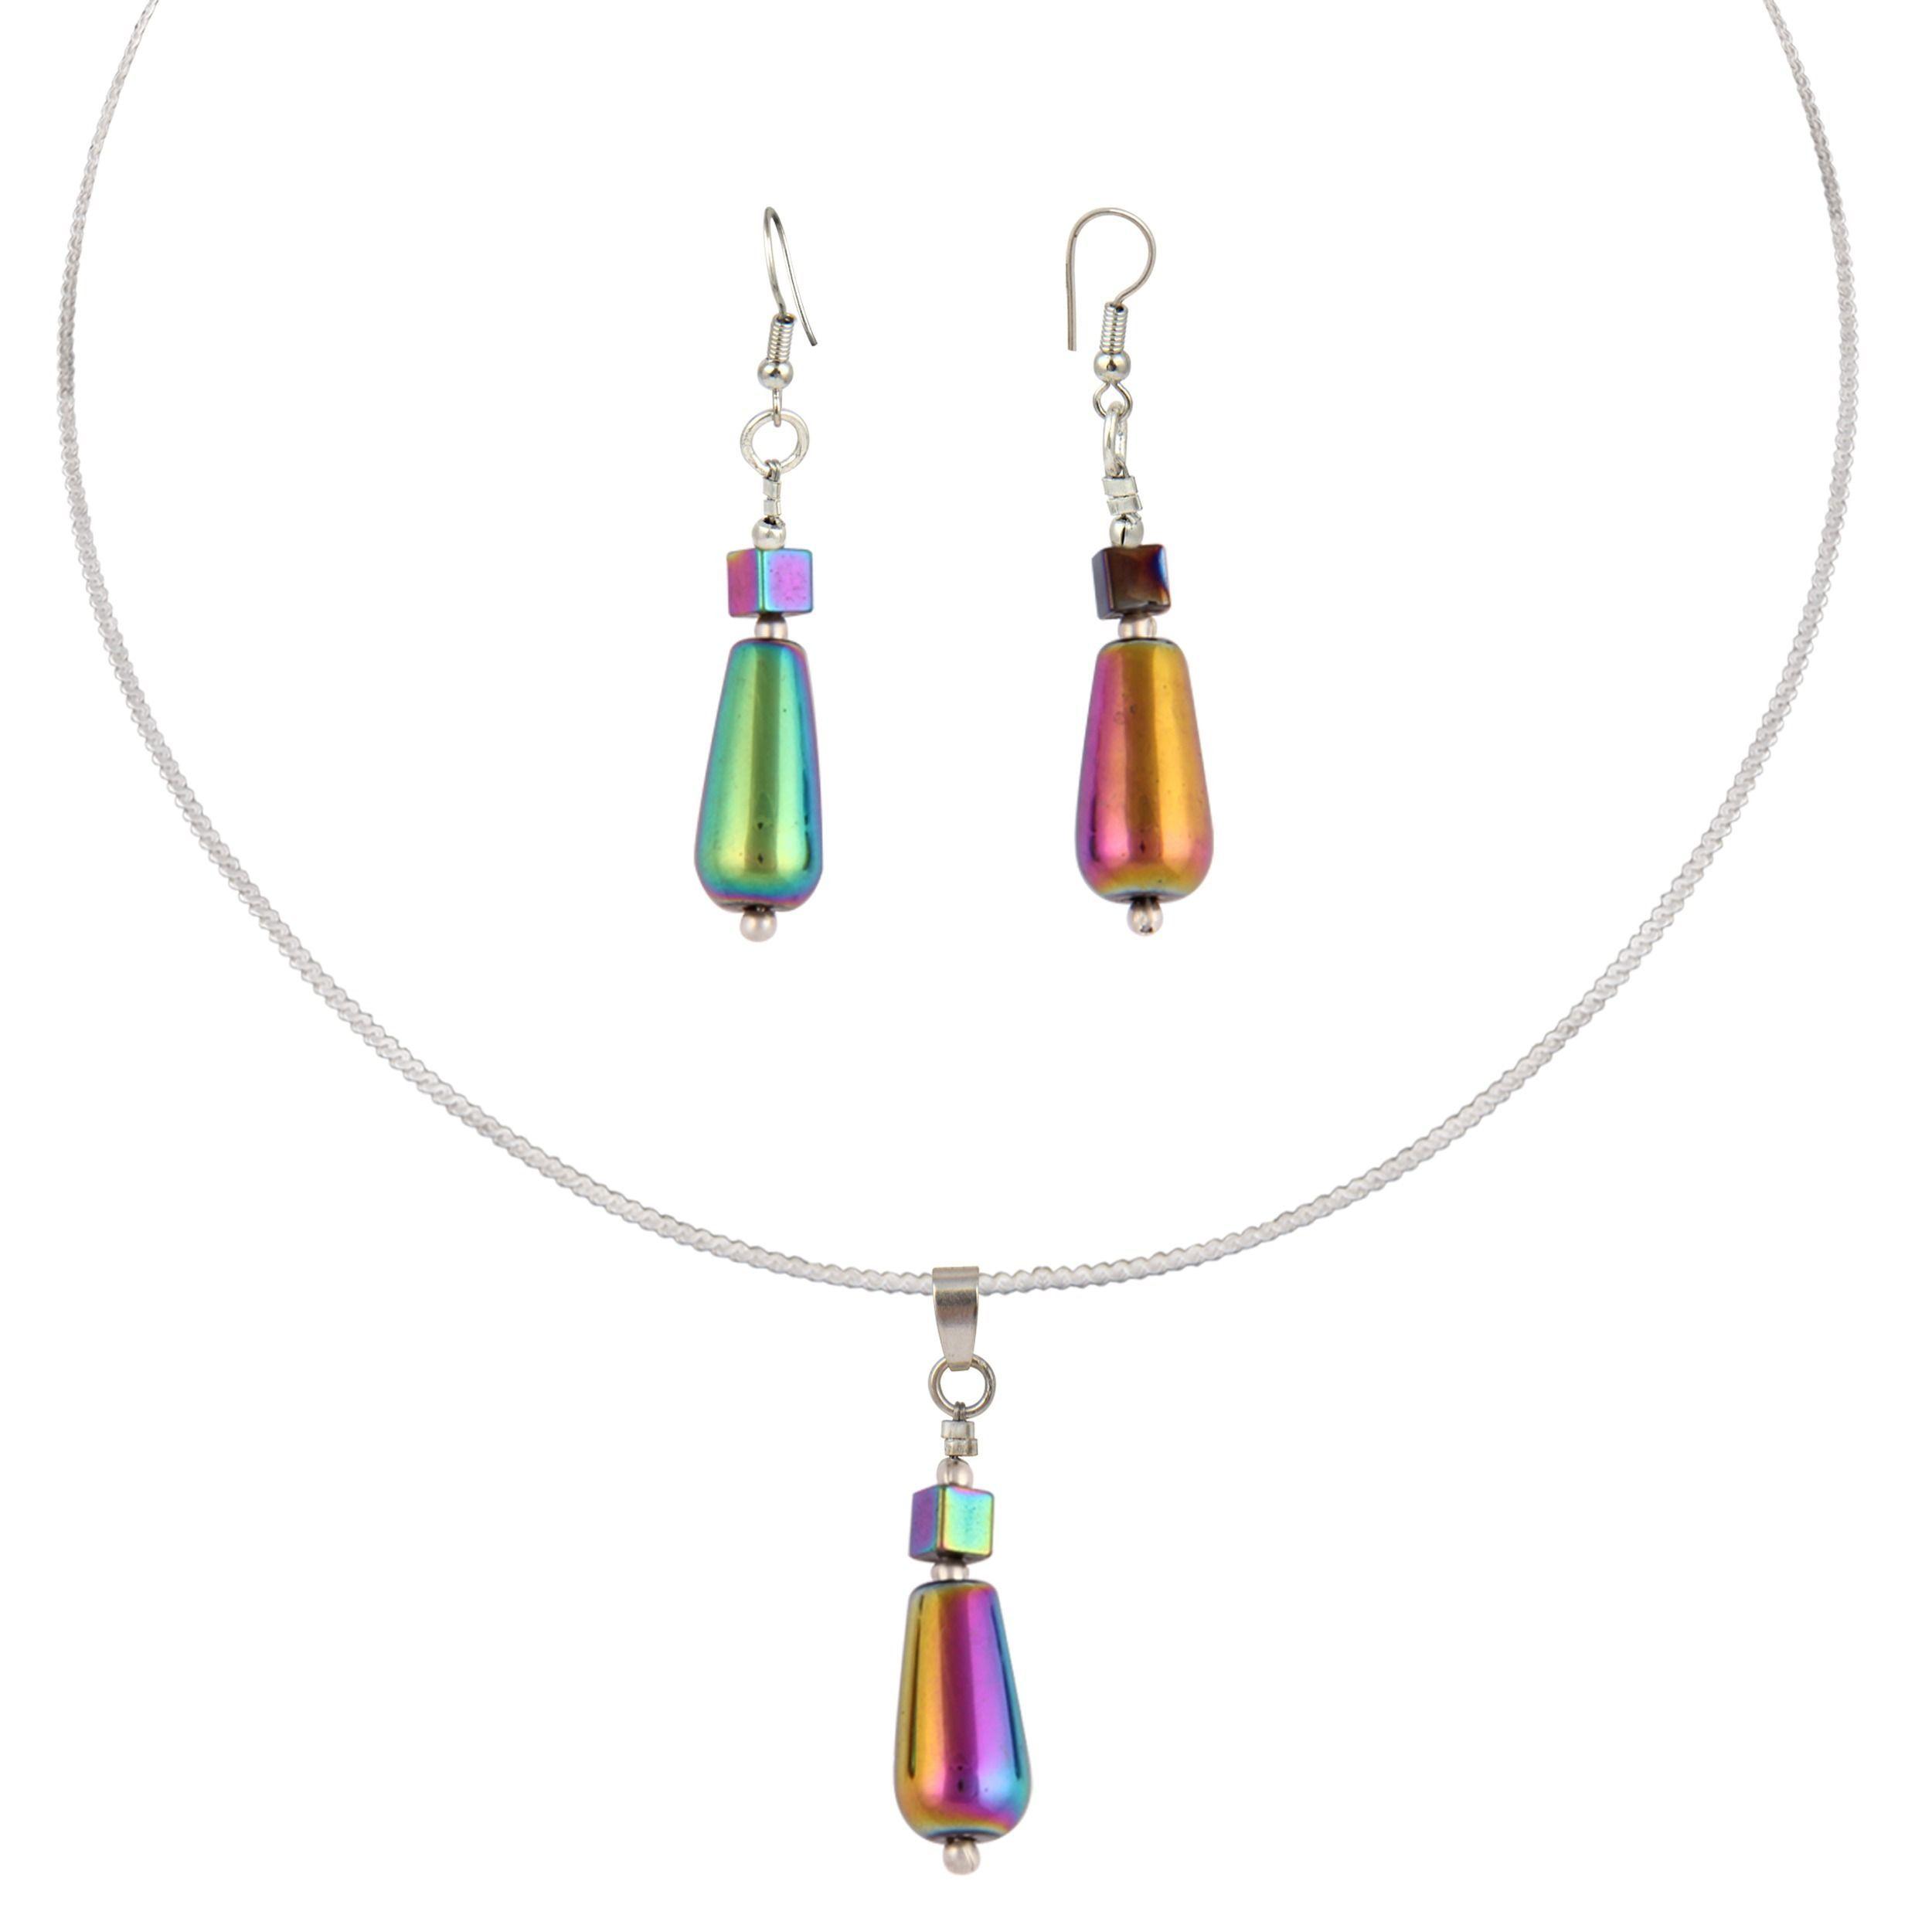 Pearlz ocean lady love inch rainbow hematite beads pendant